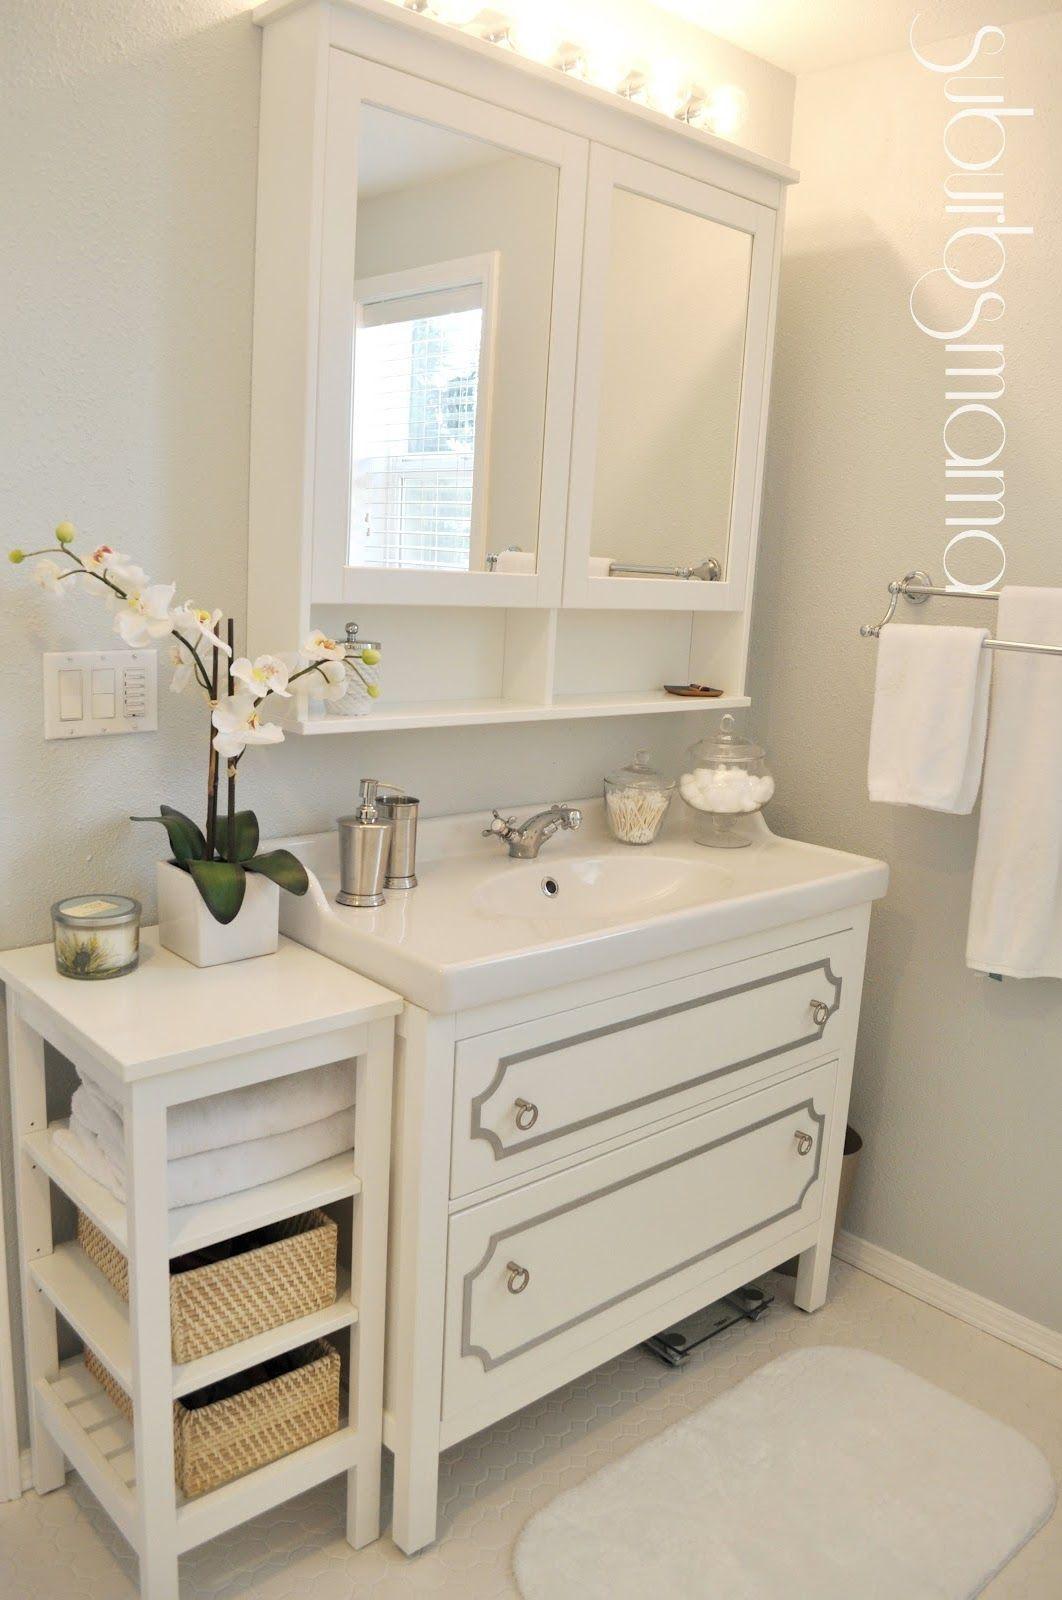 Suburbs Mama Master Bathroom Reveal Vanity Side Table Medicine Cabinet From Ikea Bathroomrefit Elegant Bathroom Decor Ikea Vanity Elegant Bathroom